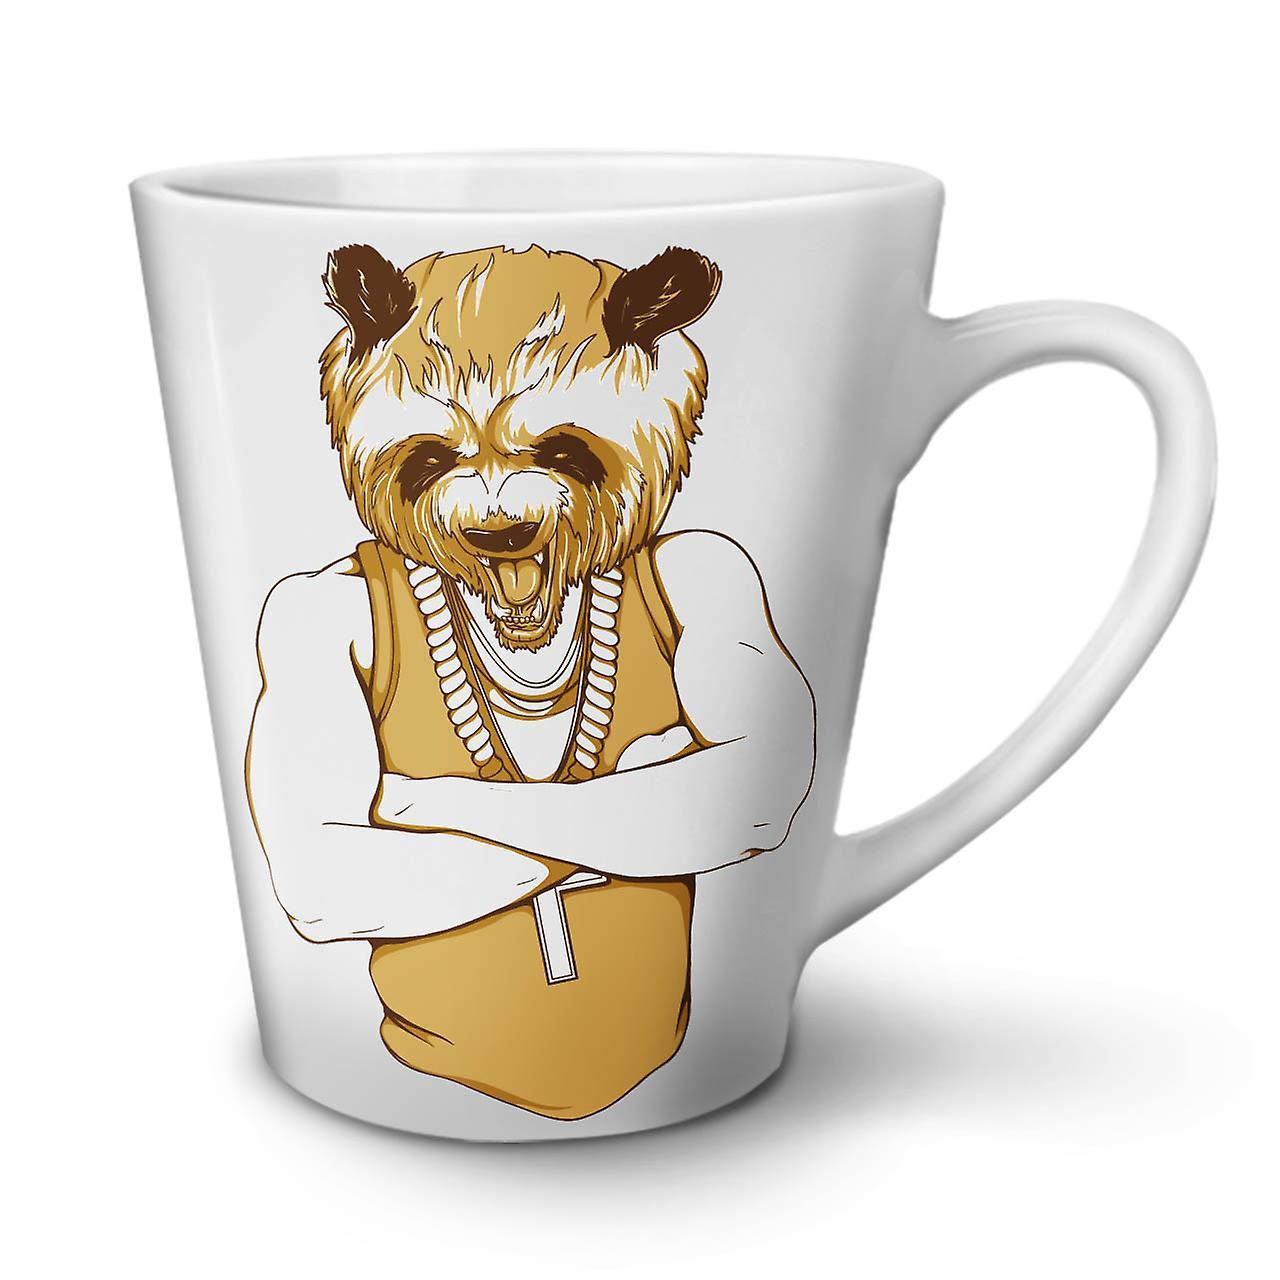 OzWellcoda Nouveau Latte Café Panda Humain Cool Céramique En Mug Blanc 12 Thé lc3uFK1TJ5